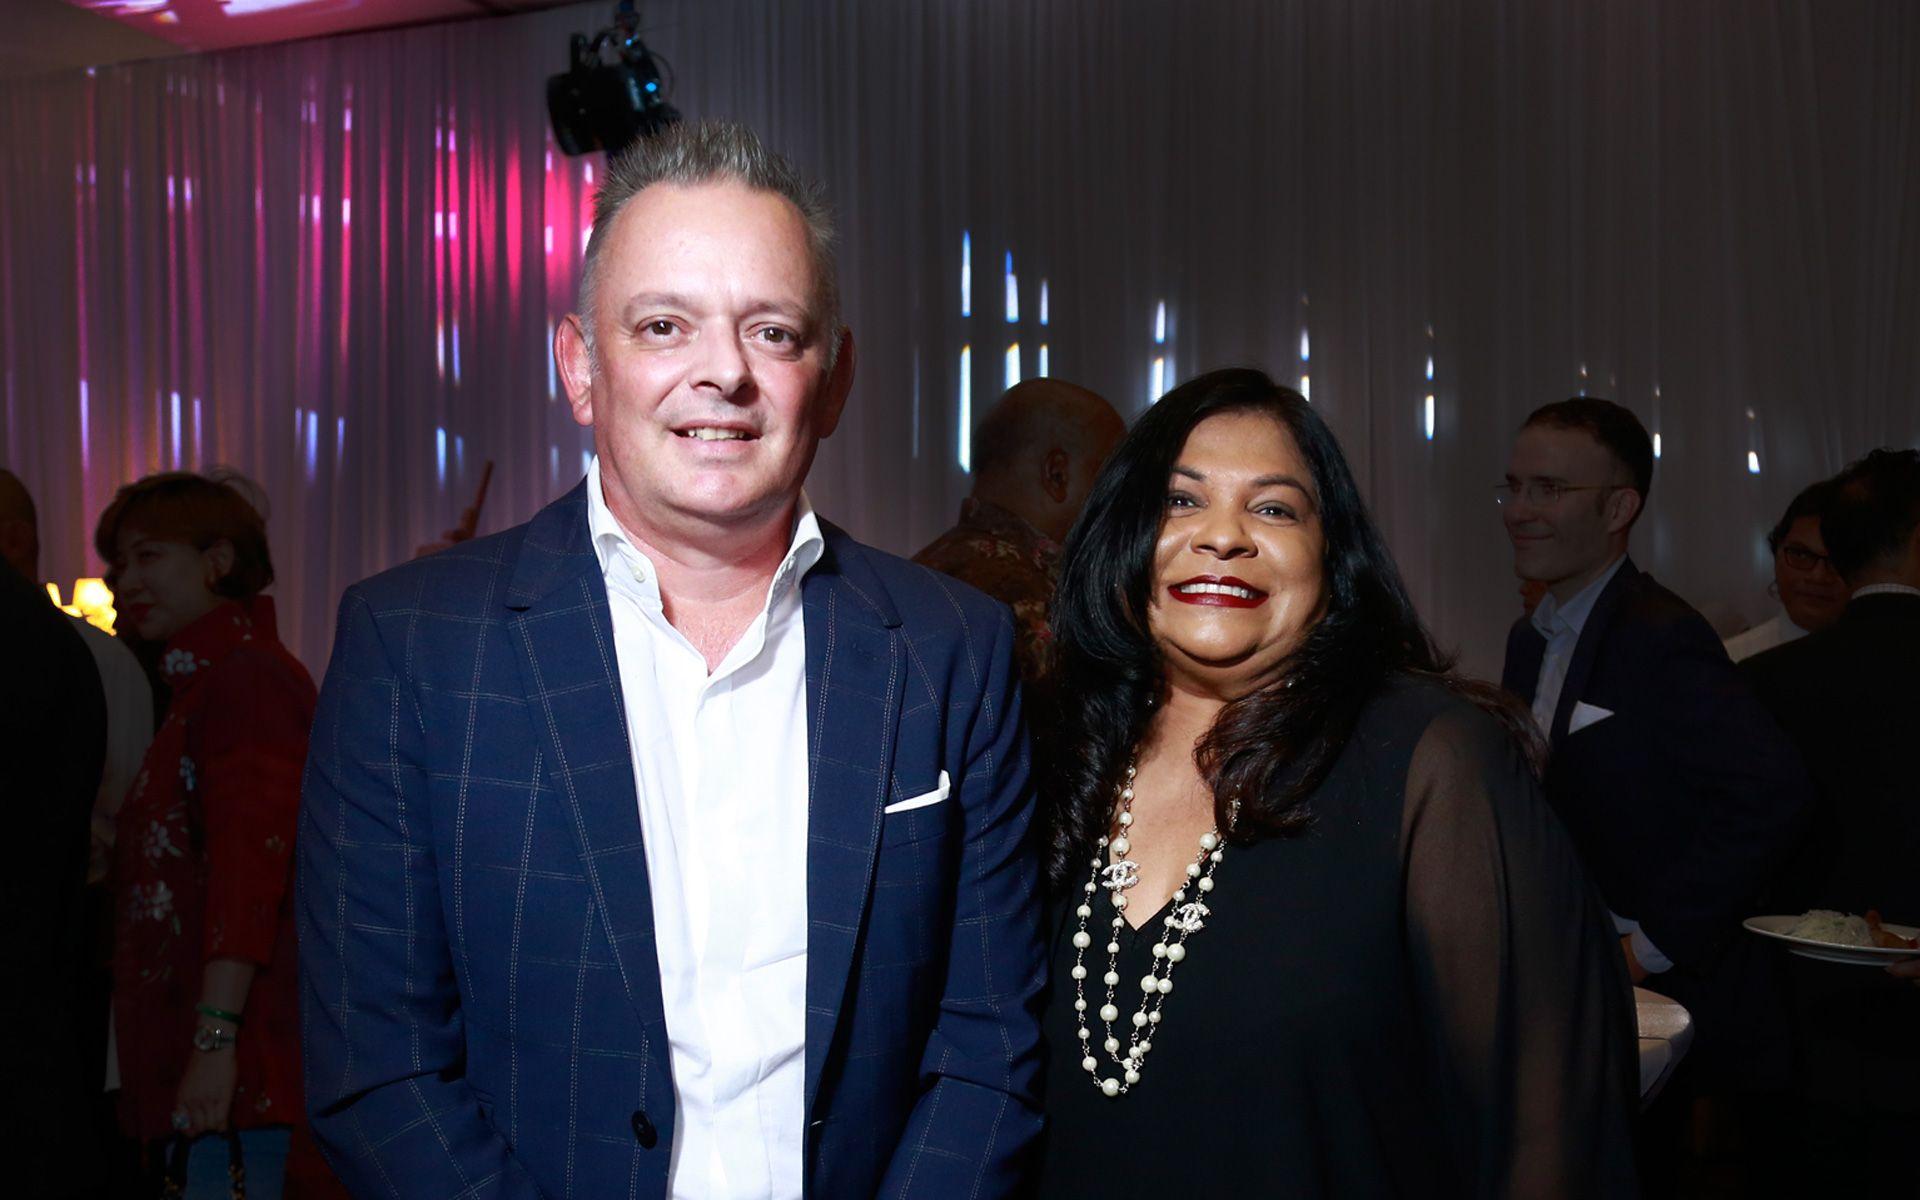 Dion Vercoe and Hazel Fernandez